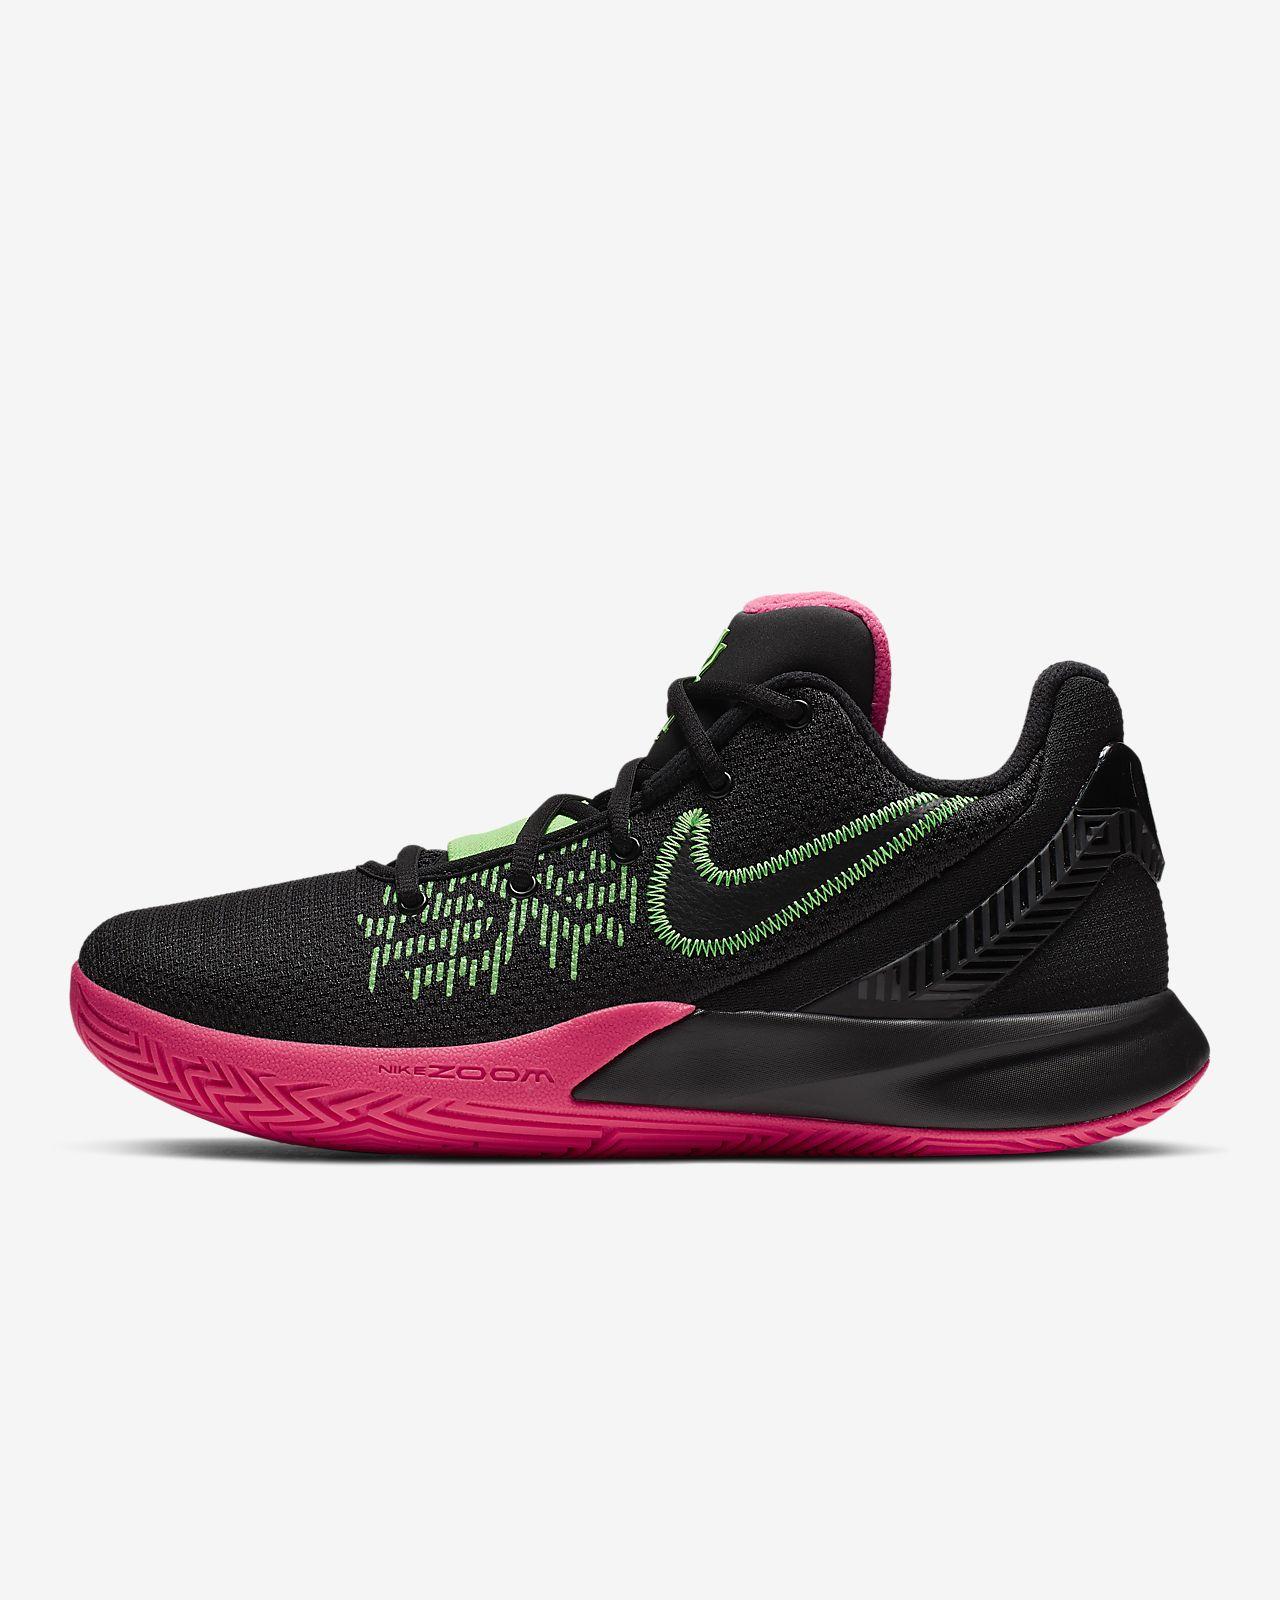 Kyrie Flytrap II EP男子篮球鞋